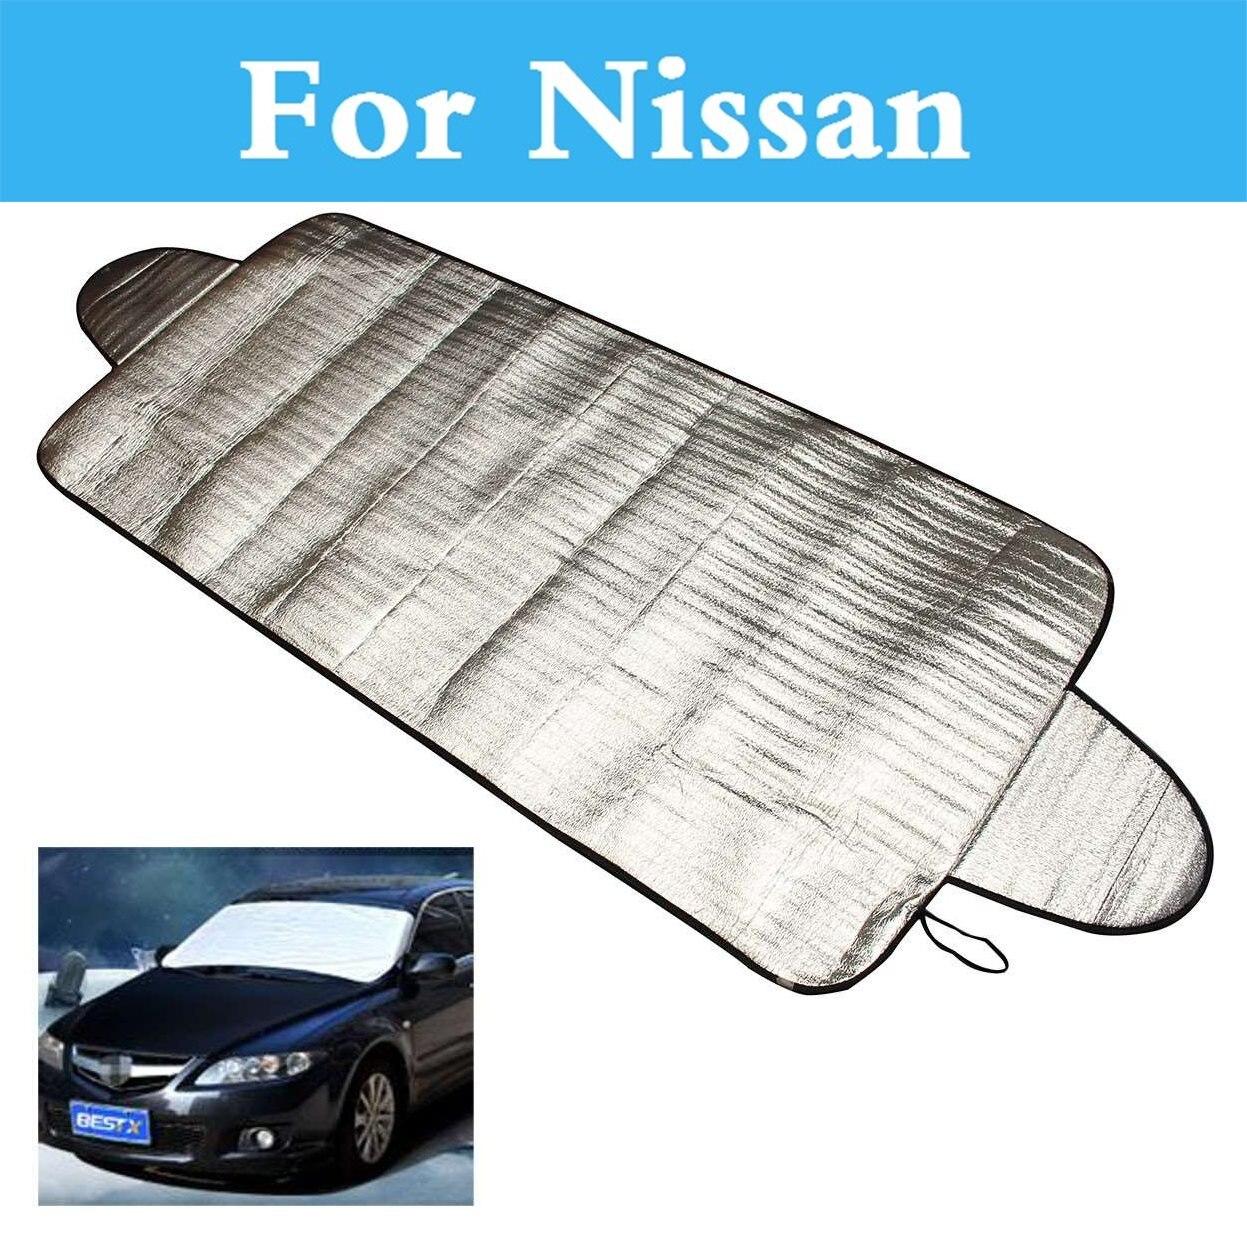 Auto Cover Car Windshield Windscreen Sunshade Sun Visor For Nissan Altima Armada Avenir Juke Nismo 350z 370z Ad Almera Classic